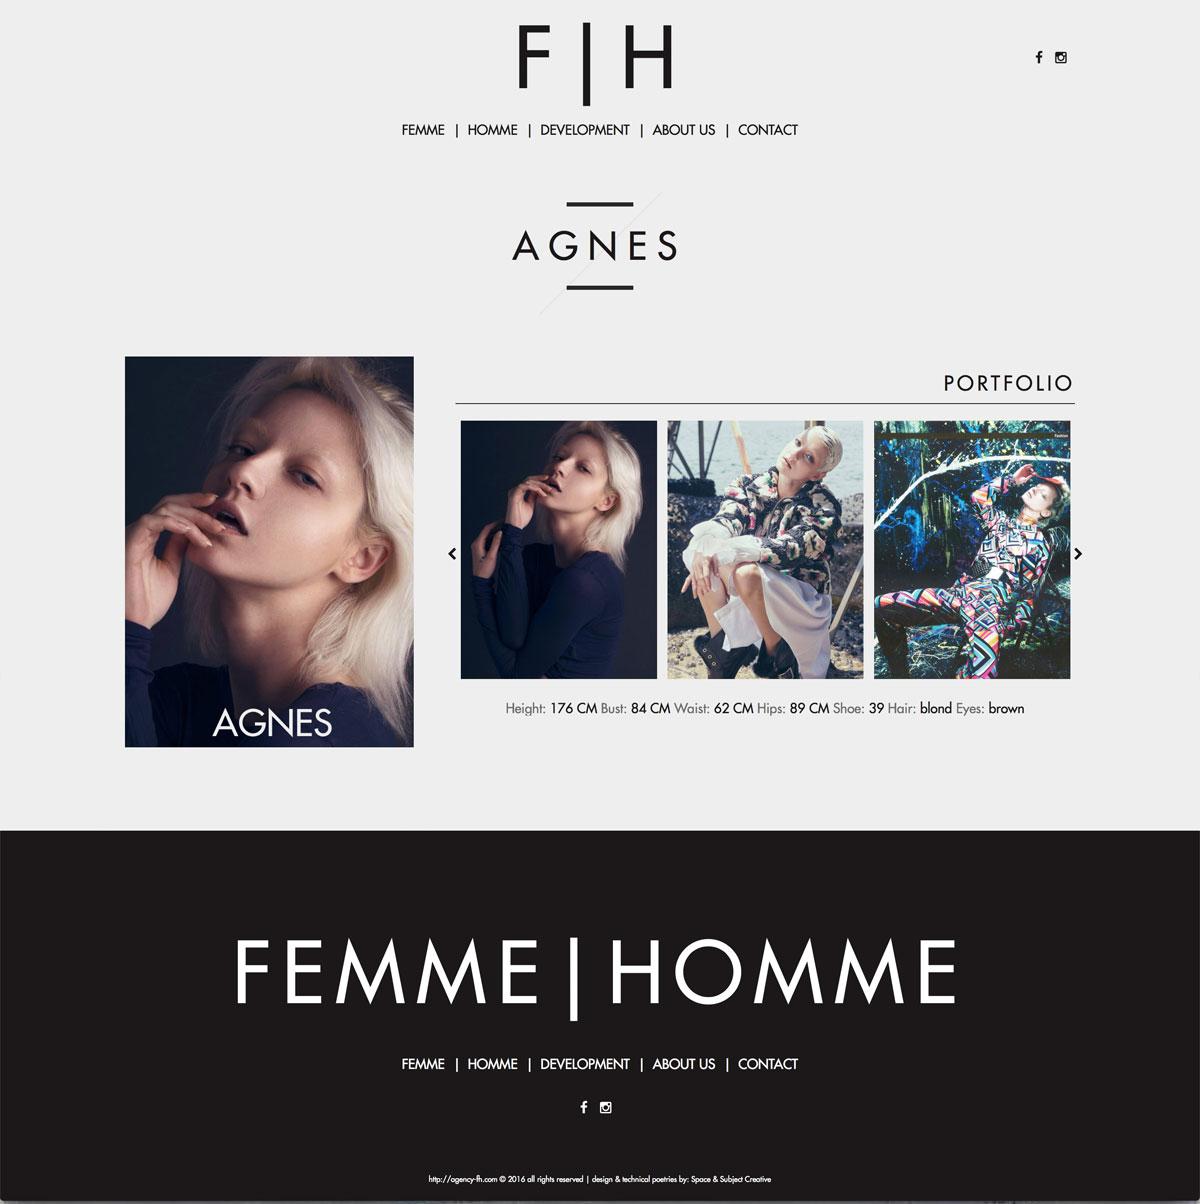 agency-fh-agnes